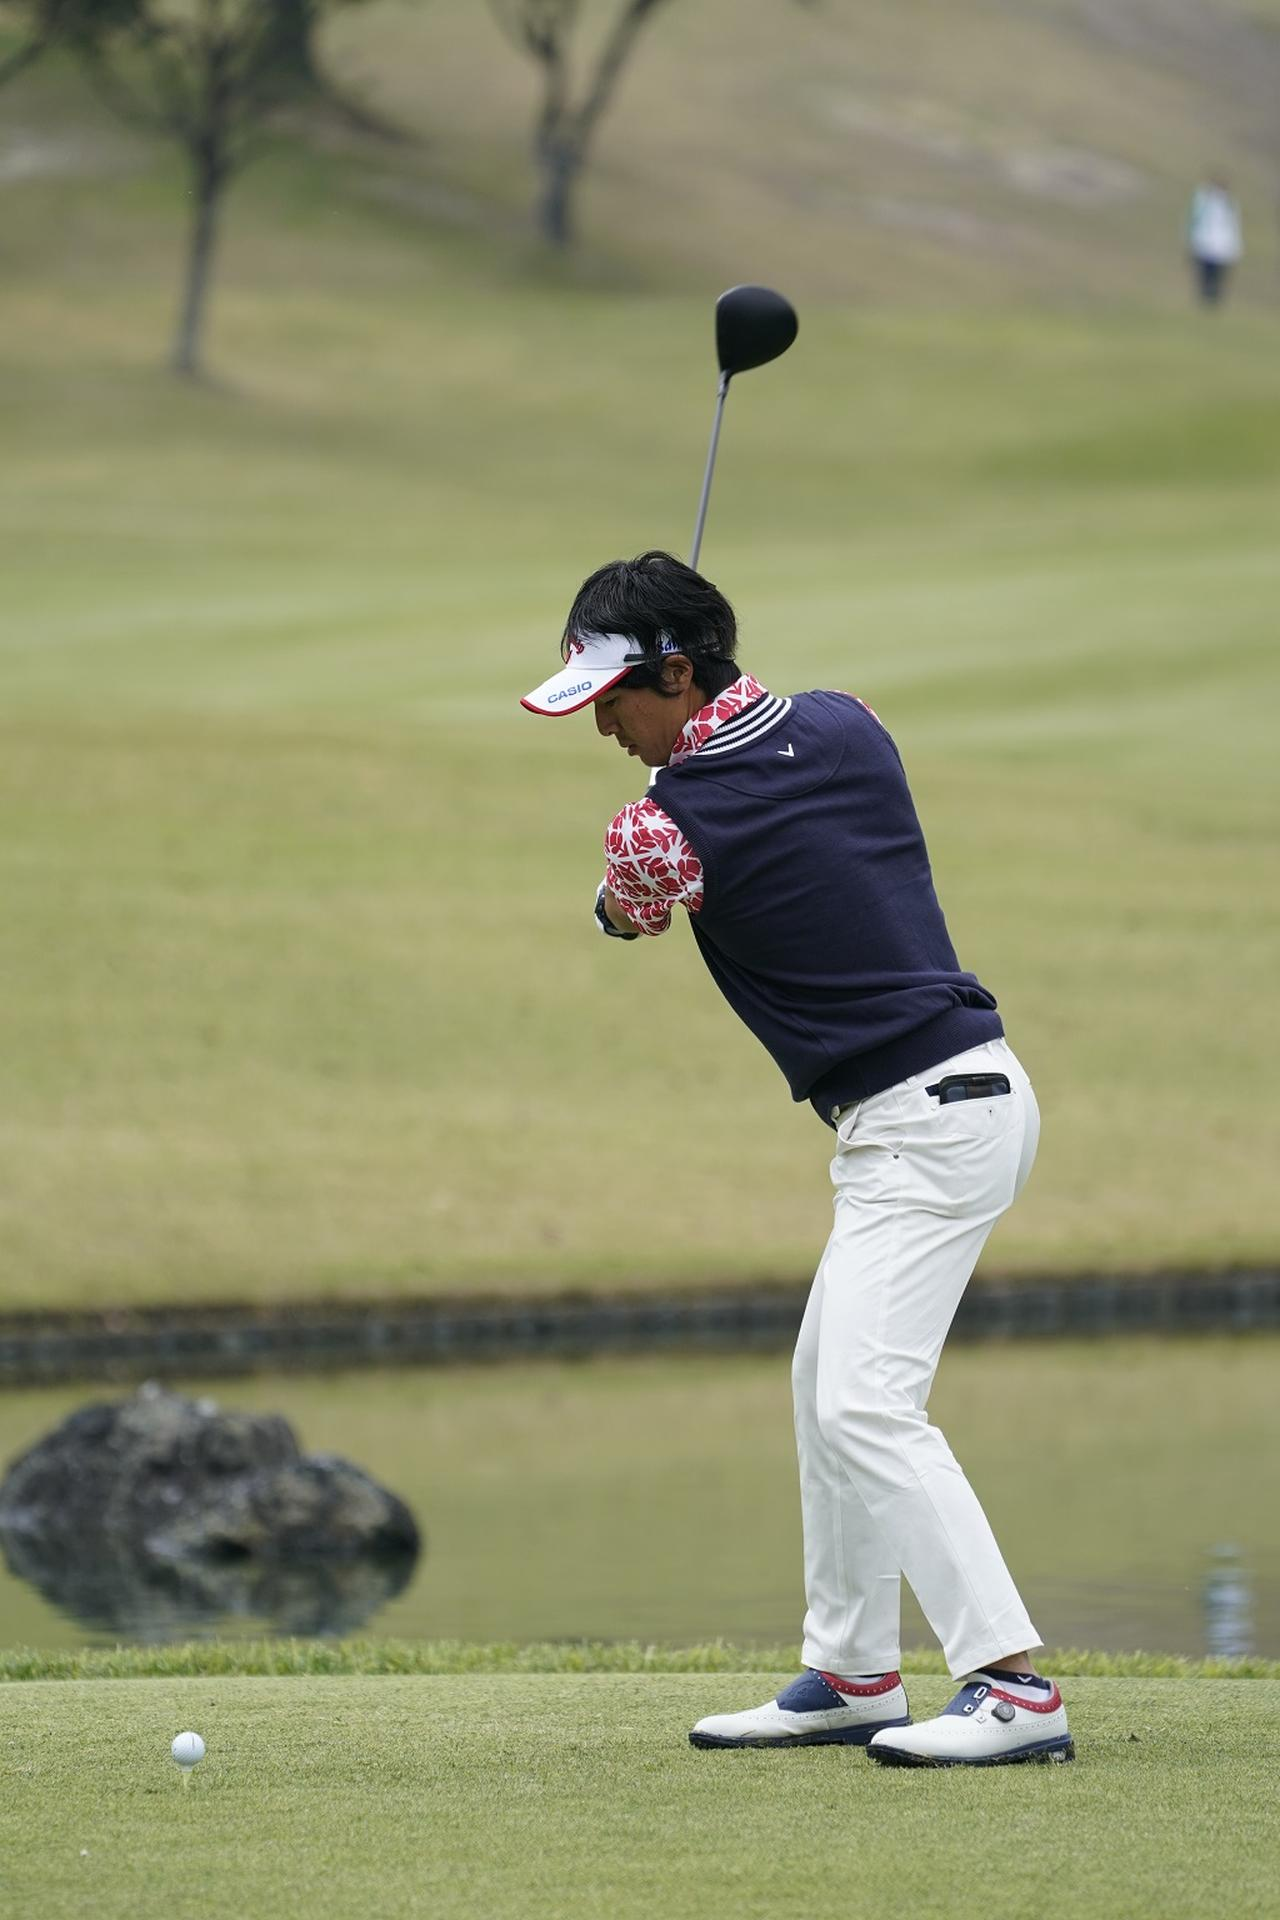 Images : 3番目の画像 - 石川遼ドライバー前方連続写真 - みんなのゴルフダイジェスト